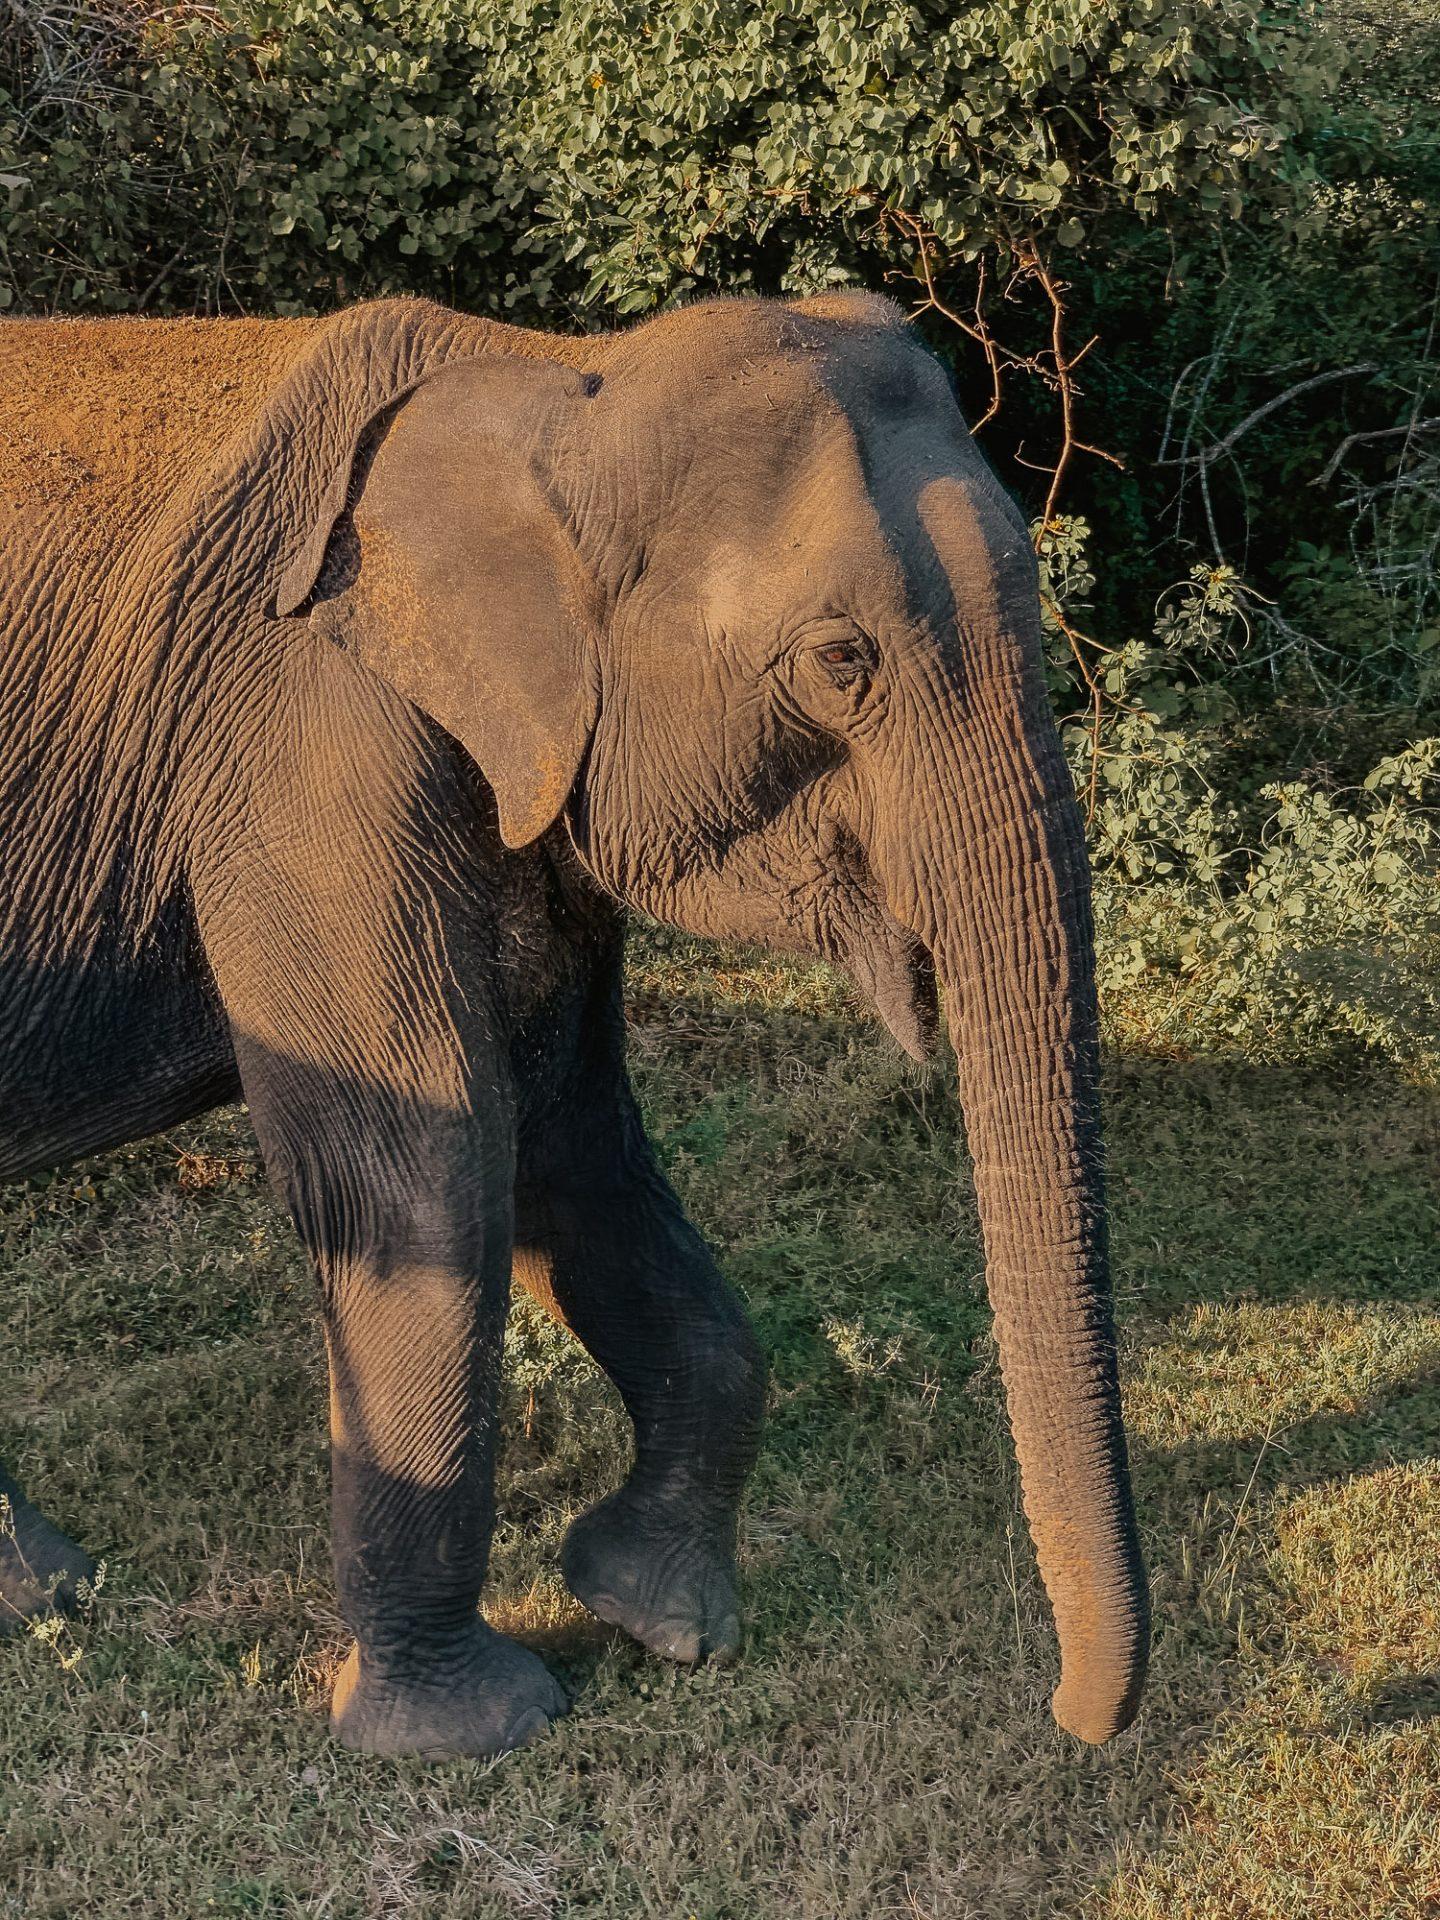 Elephant in Yala National Park Sri Lanka Itinerary